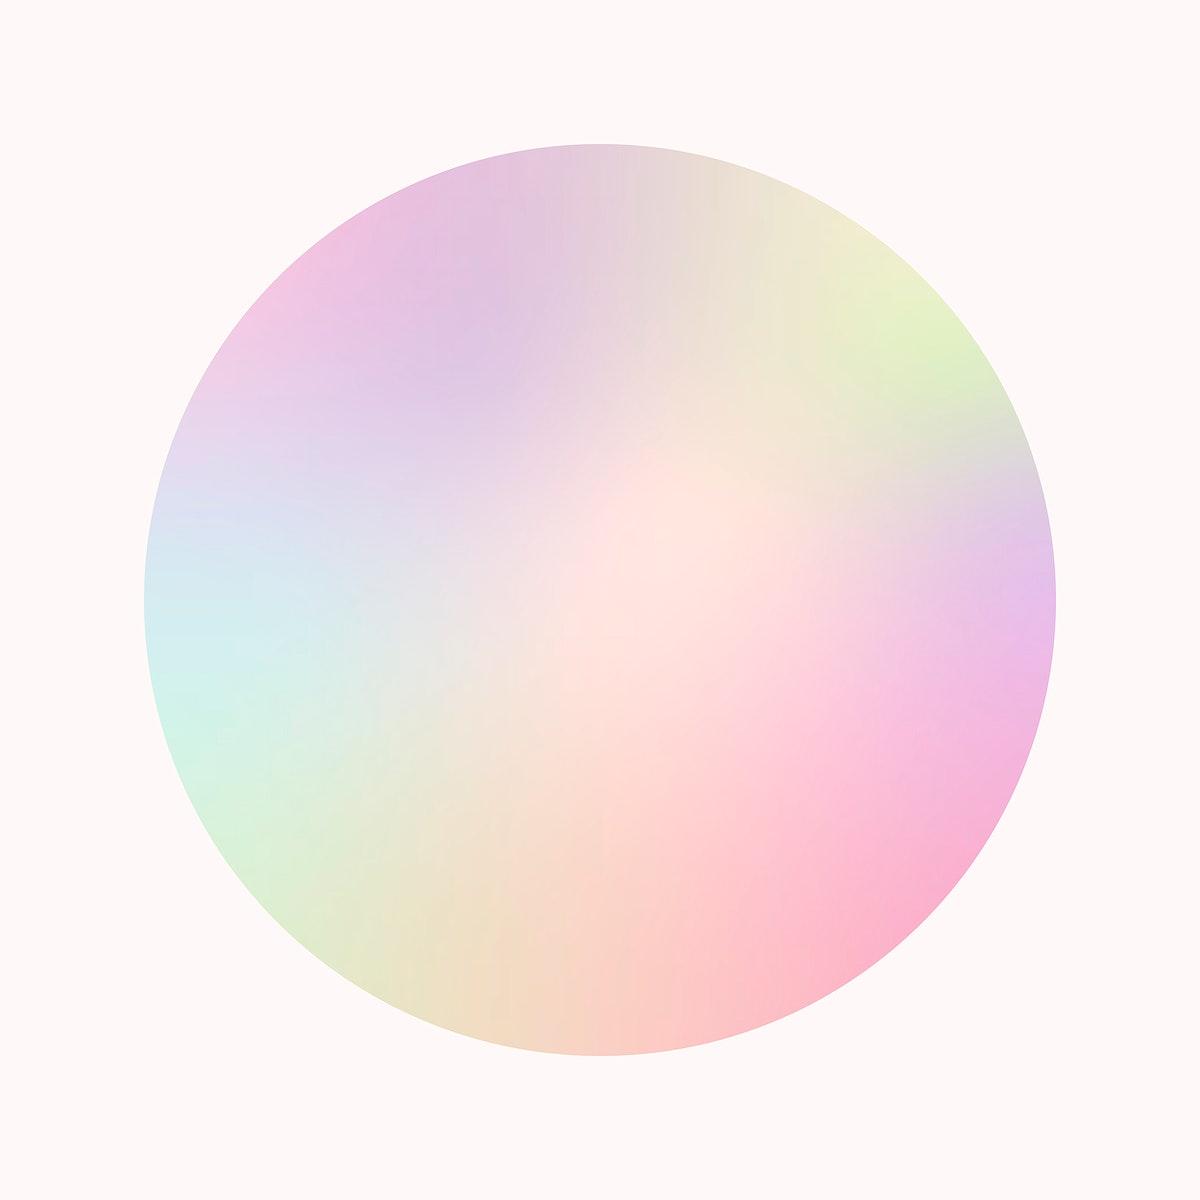 Colorful round gradient element vector